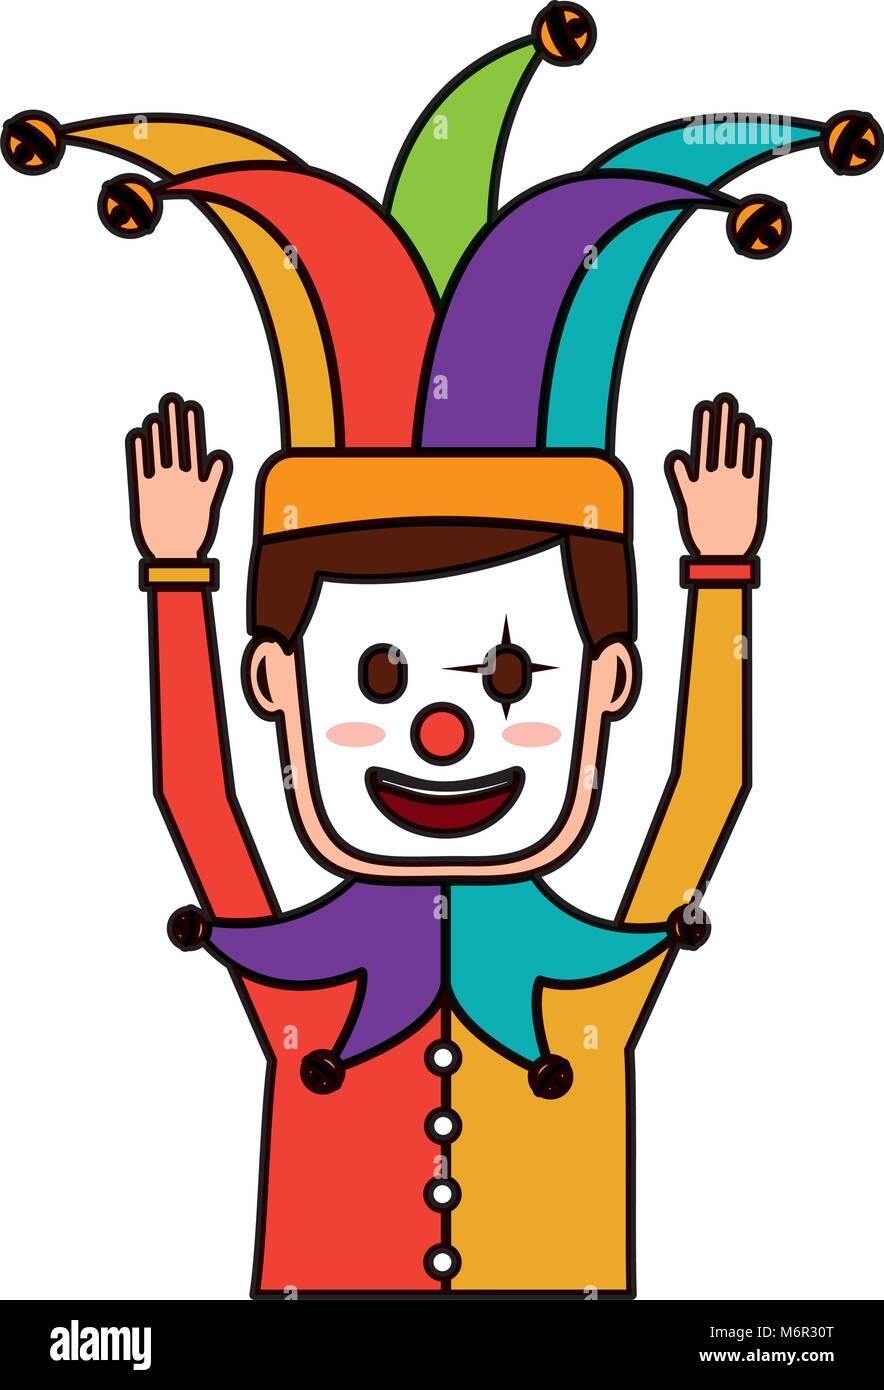 Cartoon Mann Mit Clown Maske Hofnarr Hut Lustig Vector Illustration